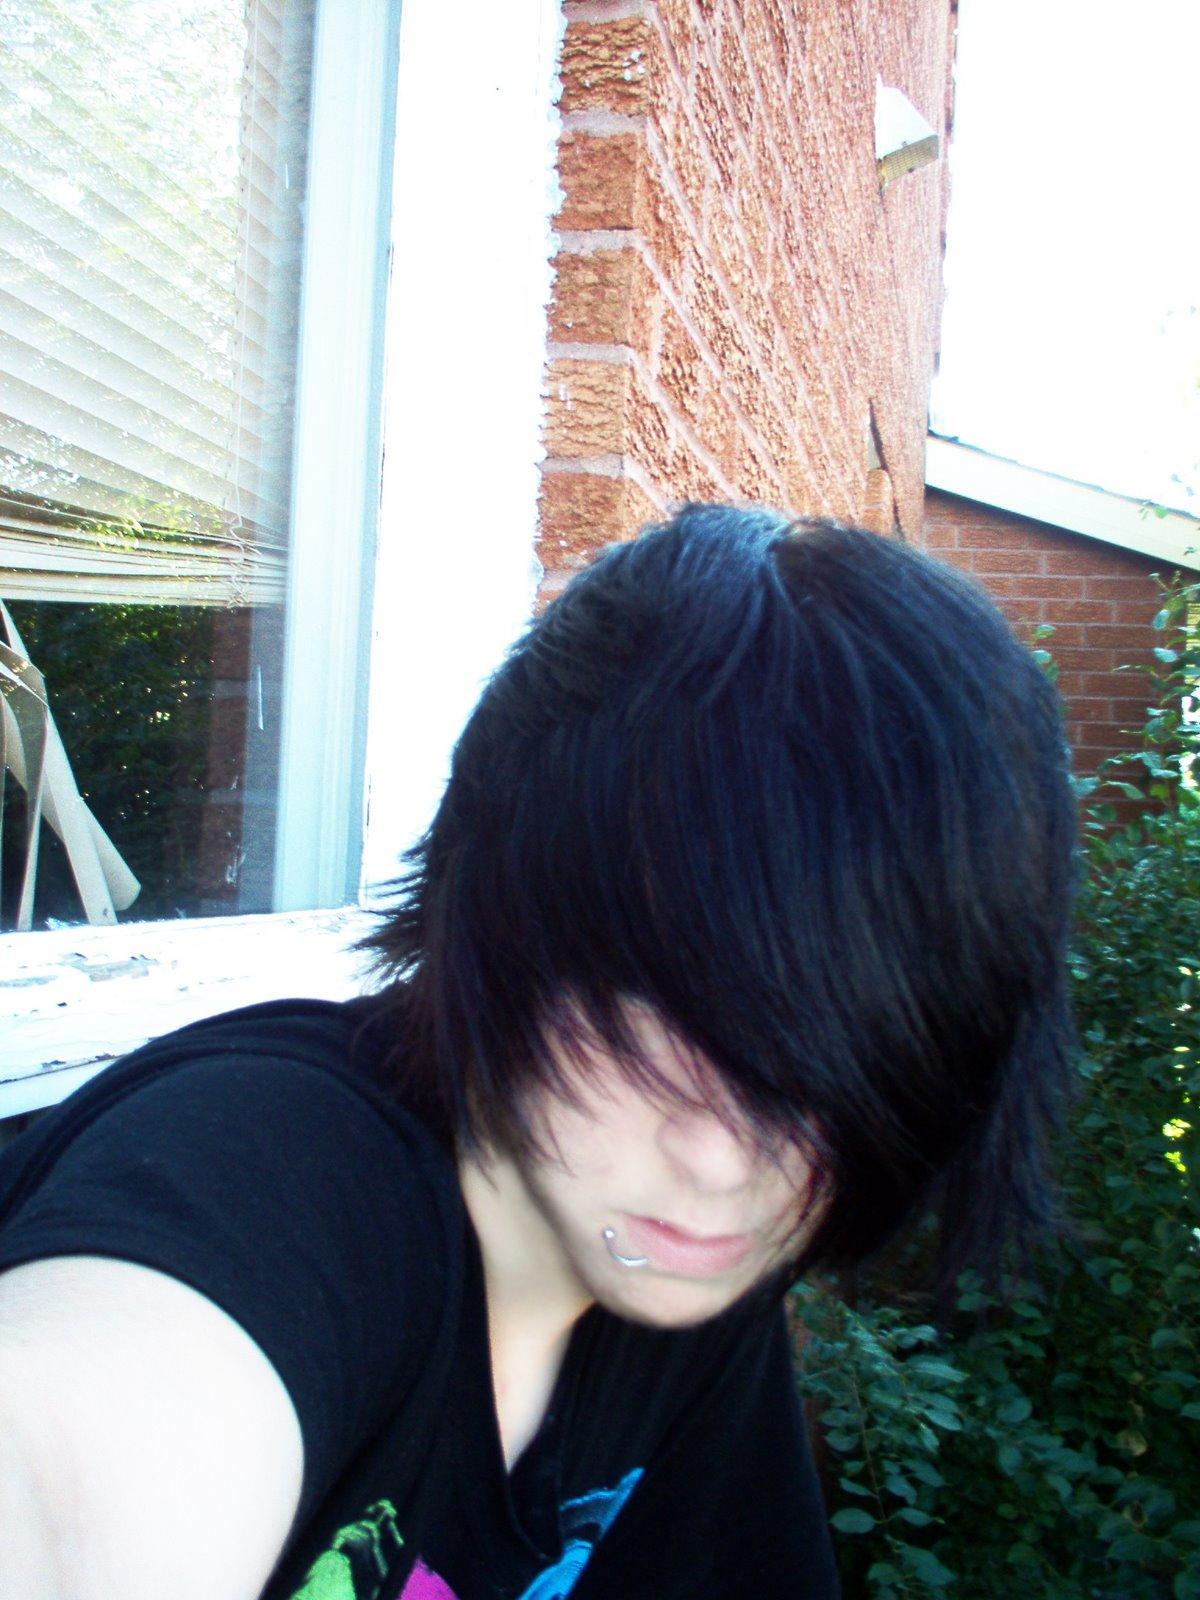 Emo Hair Emo Hairstyles Emo Haircuts Crazy Emo Hair